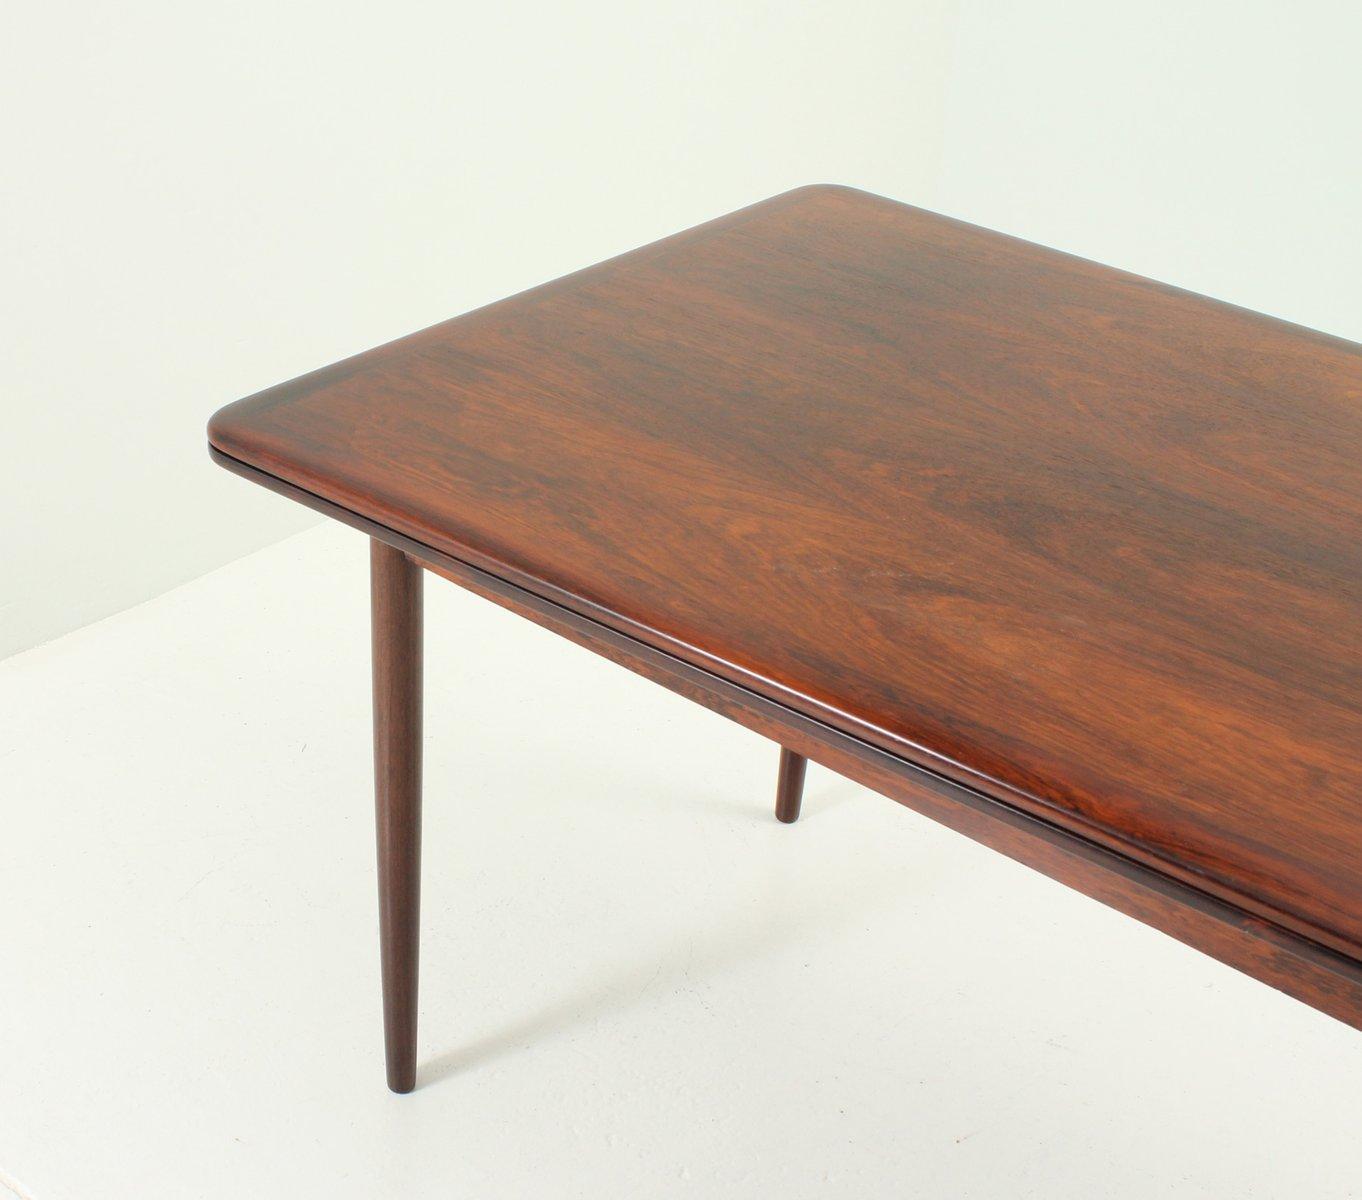 table de salle manger extensible en palissandre danemark 1950s en vente sur pamono. Black Bedroom Furniture Sets. Home Design Ideas